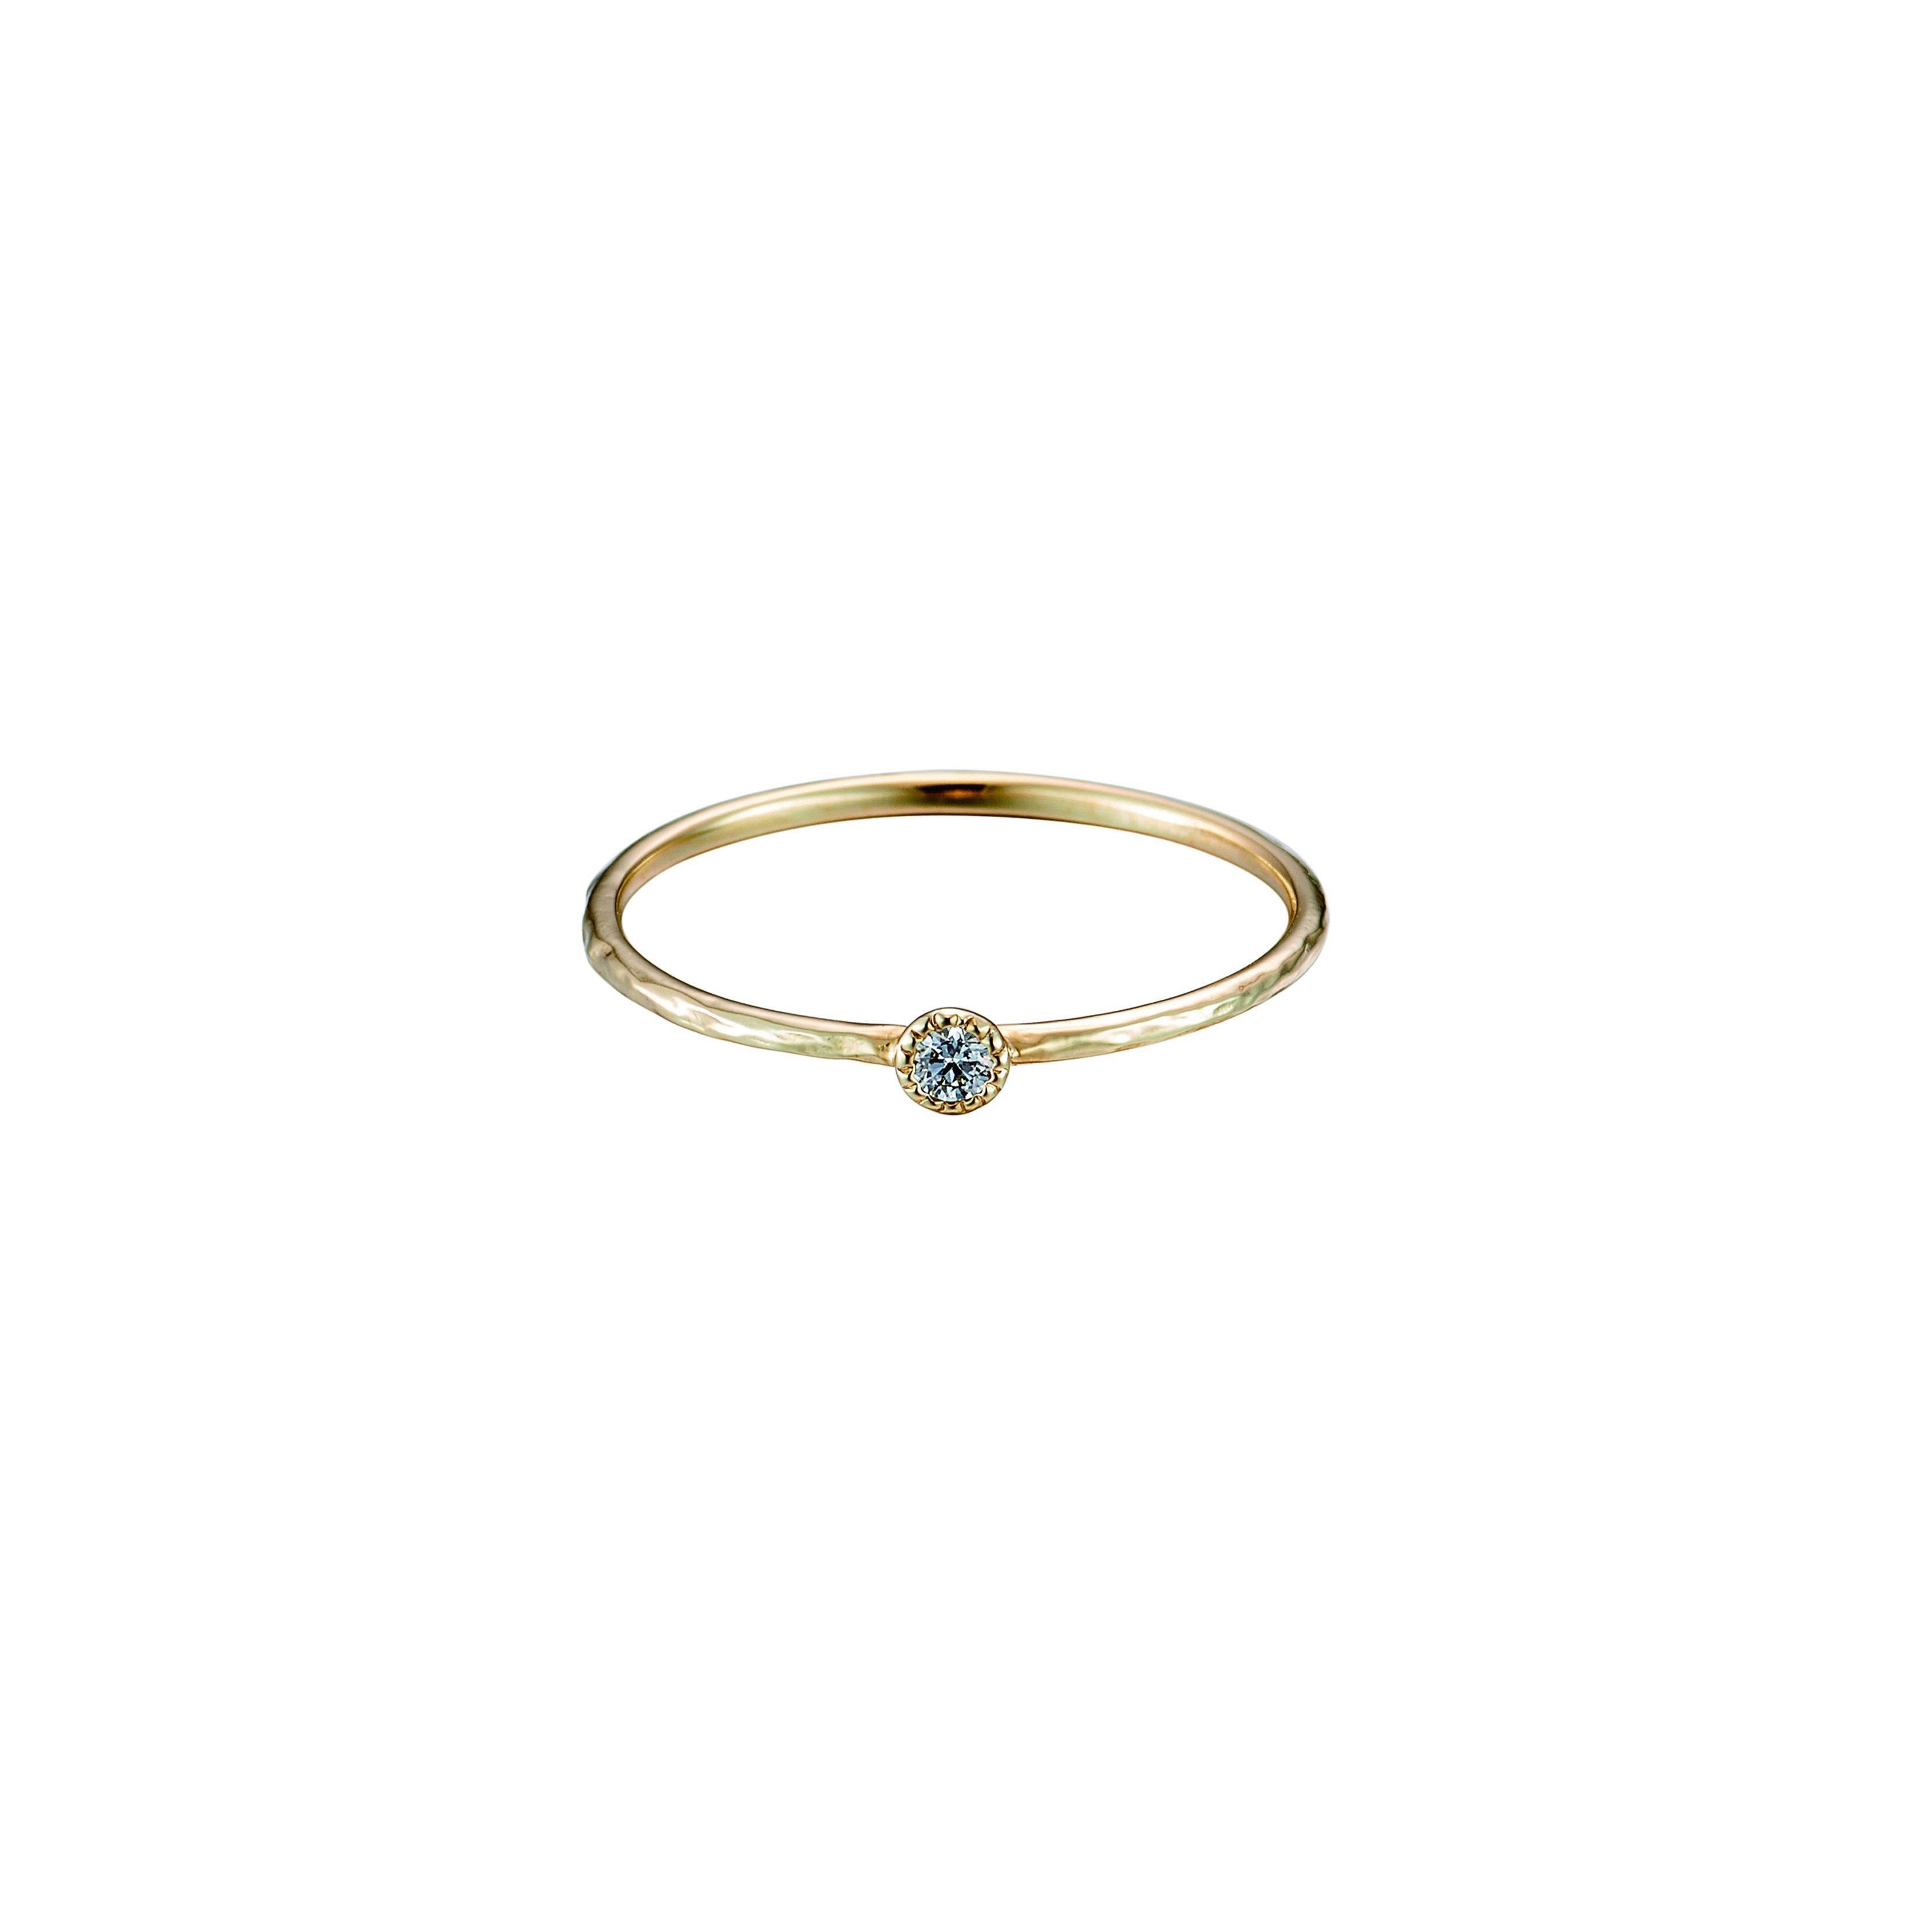 K18 One Diamond Ring